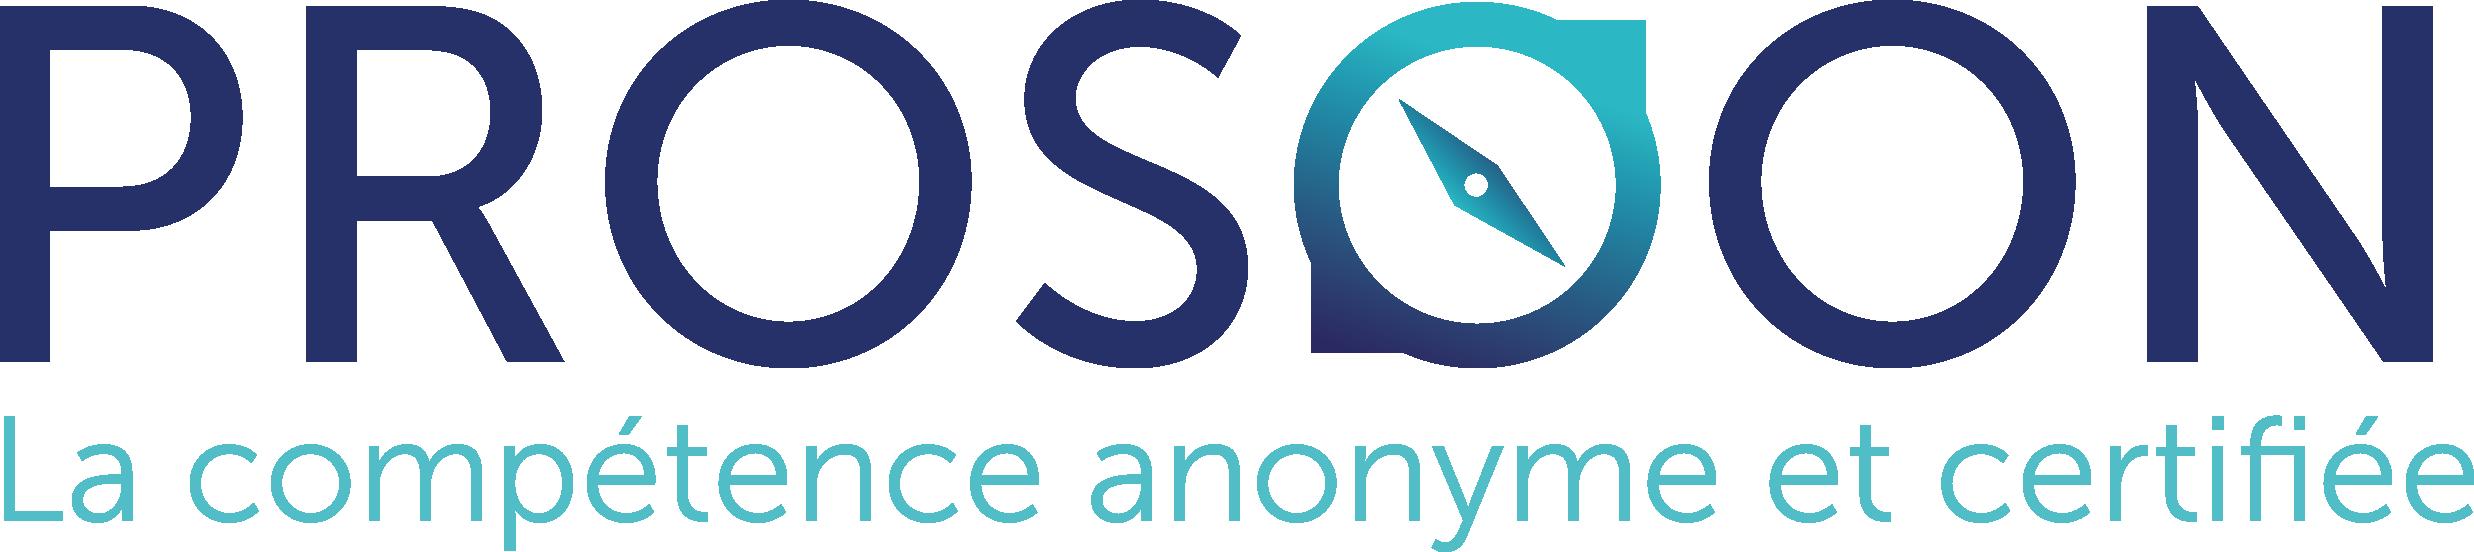 prosoon_logo-2-2.png